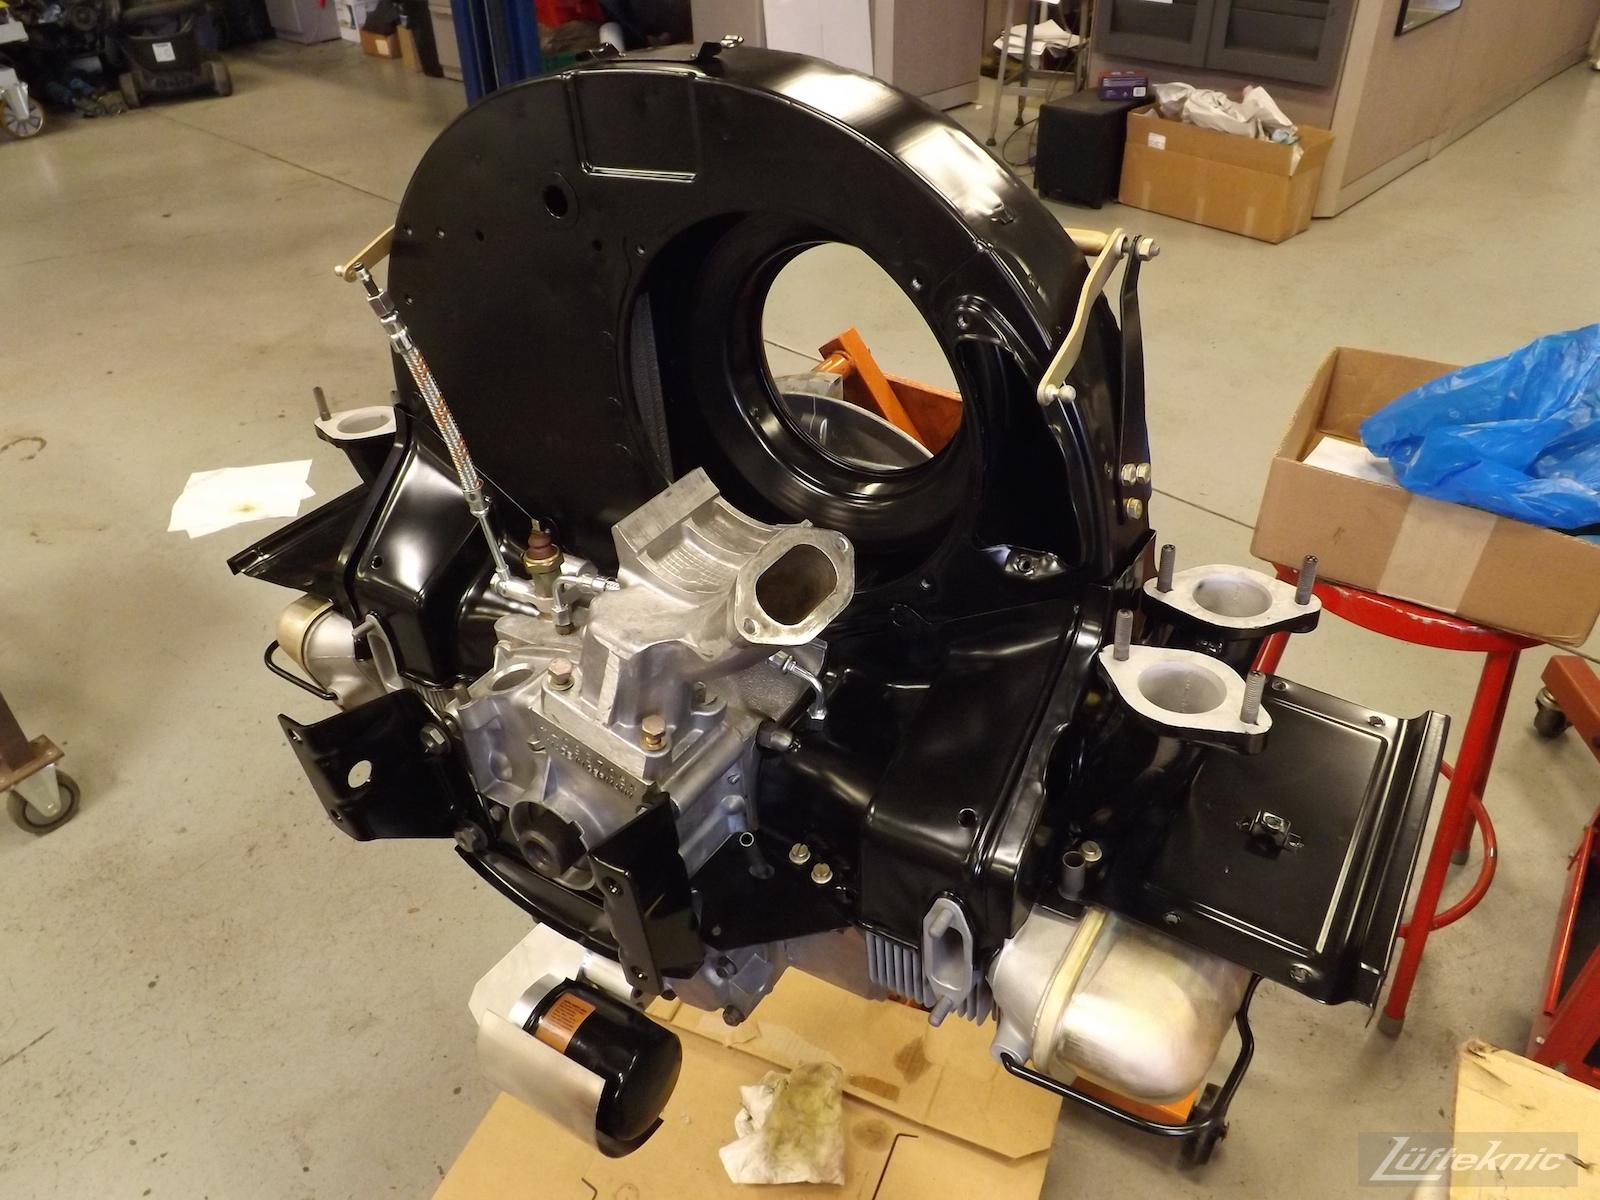 Engine nearly finished on an Irish Green Porsche 912 undergoing restoration at Lufteknic.